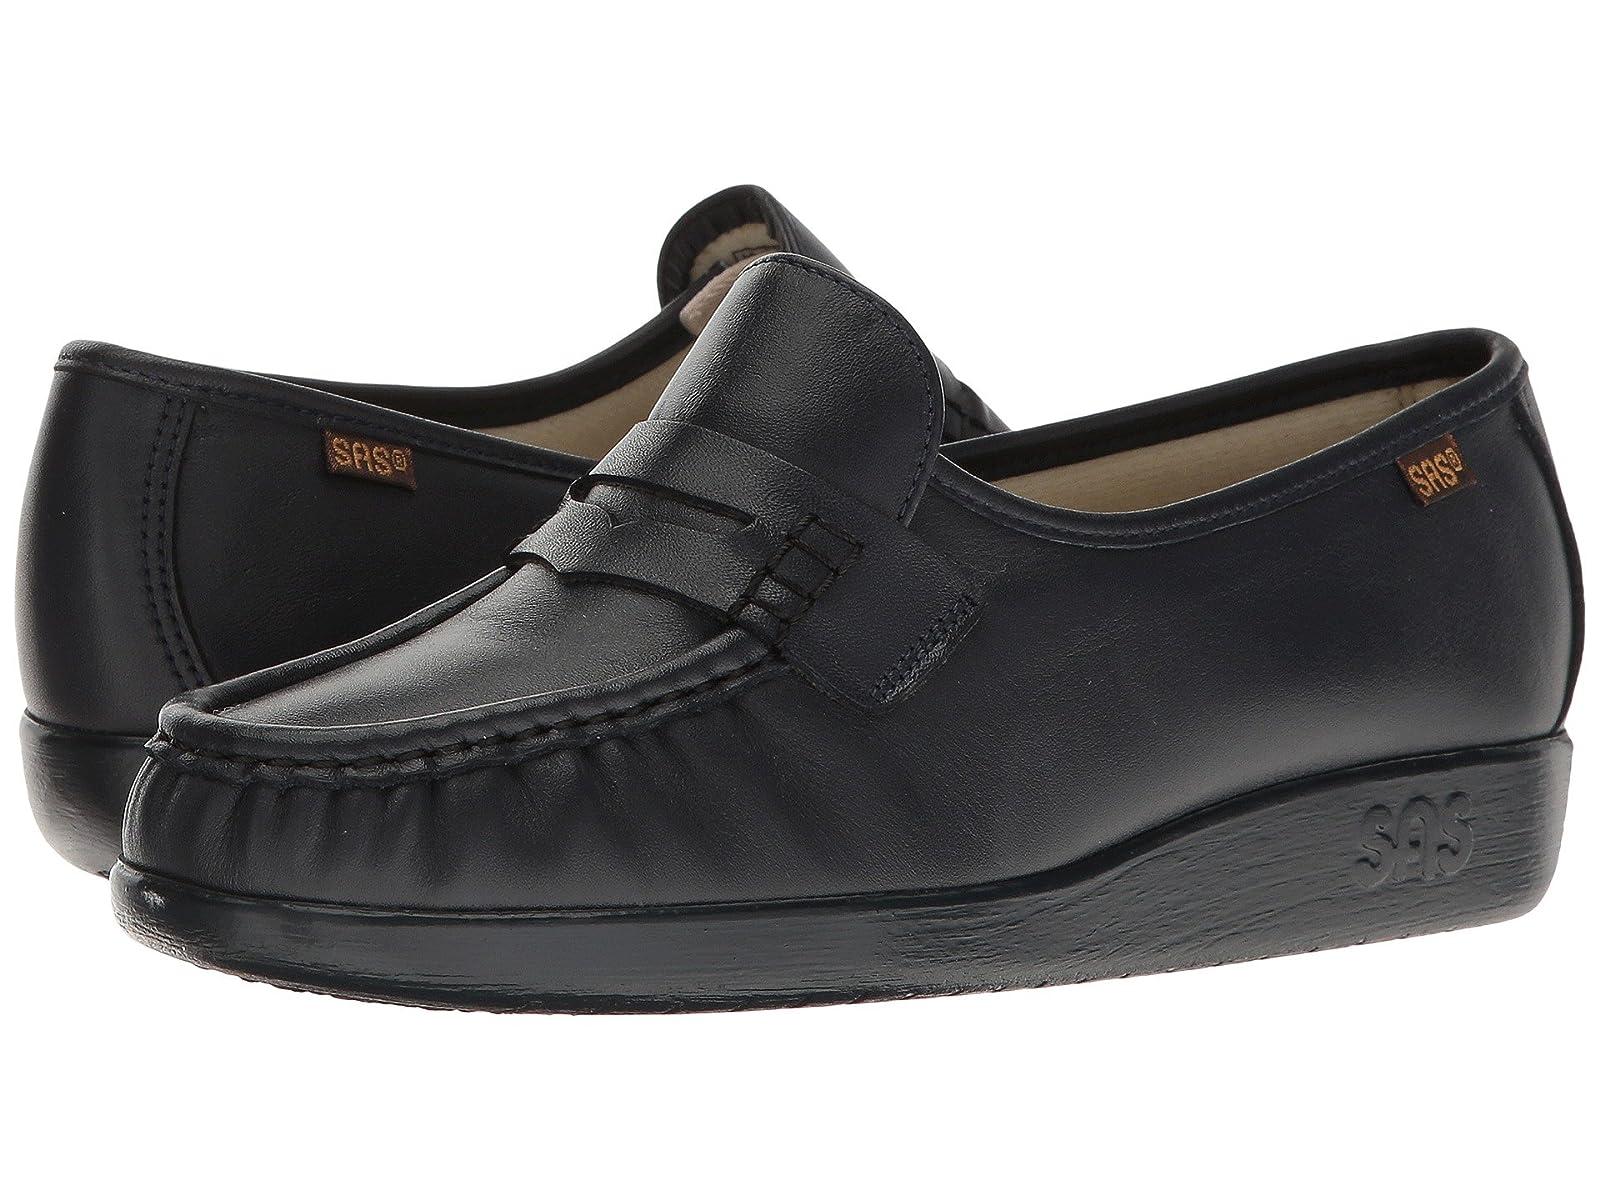 SAS ClassicAtmospheric grades have affordable shoes